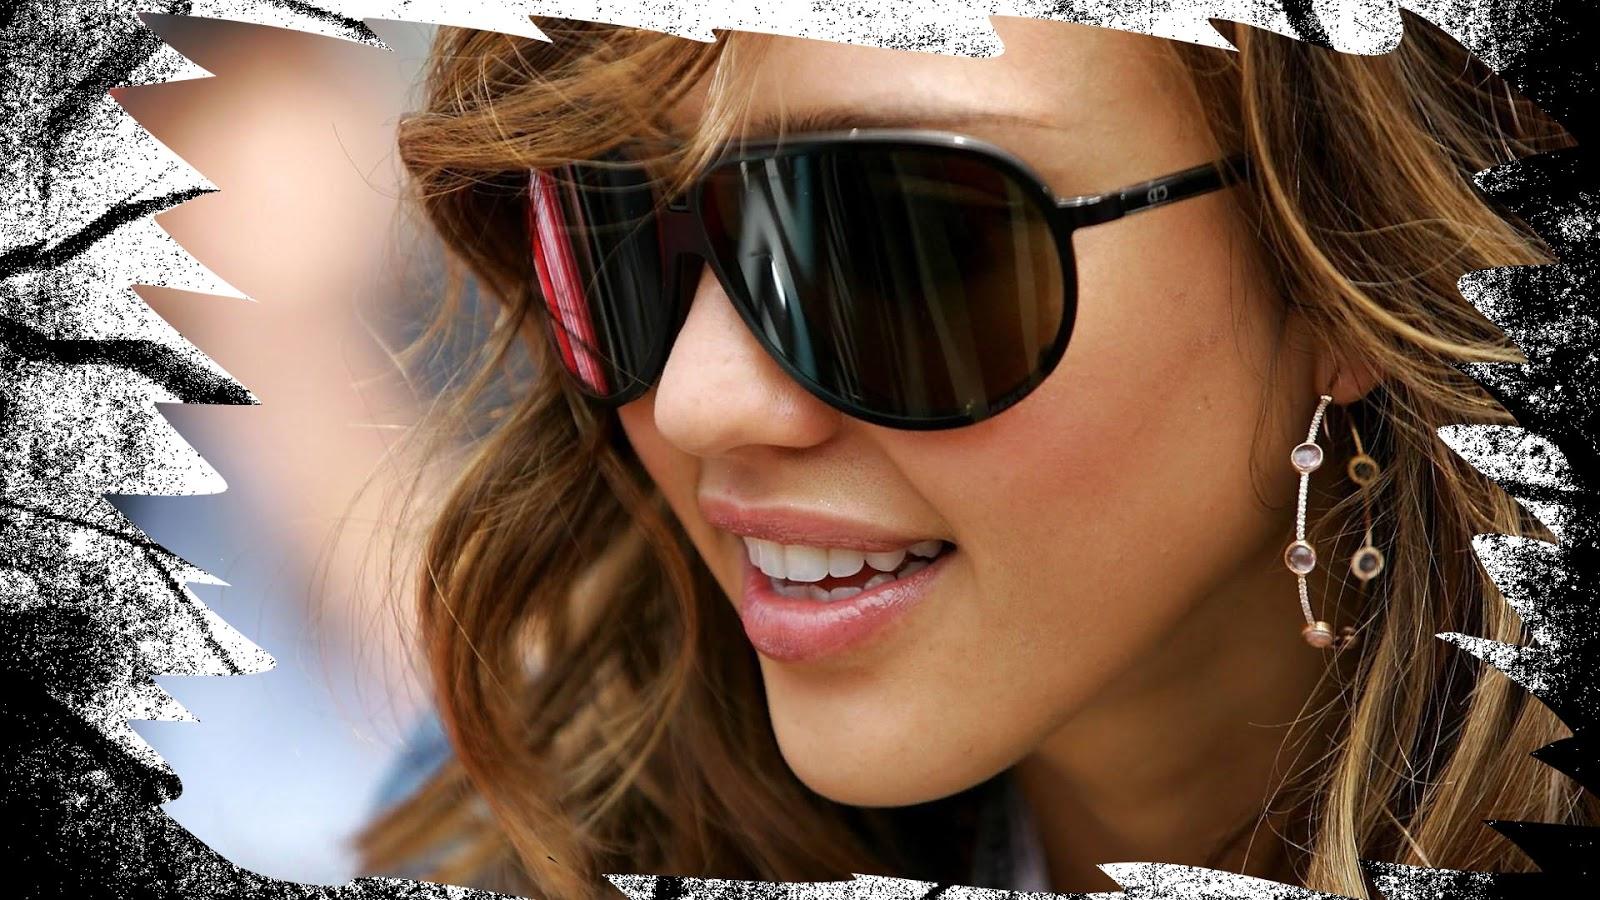 Фото красивых девушек в очках от солнца на аву